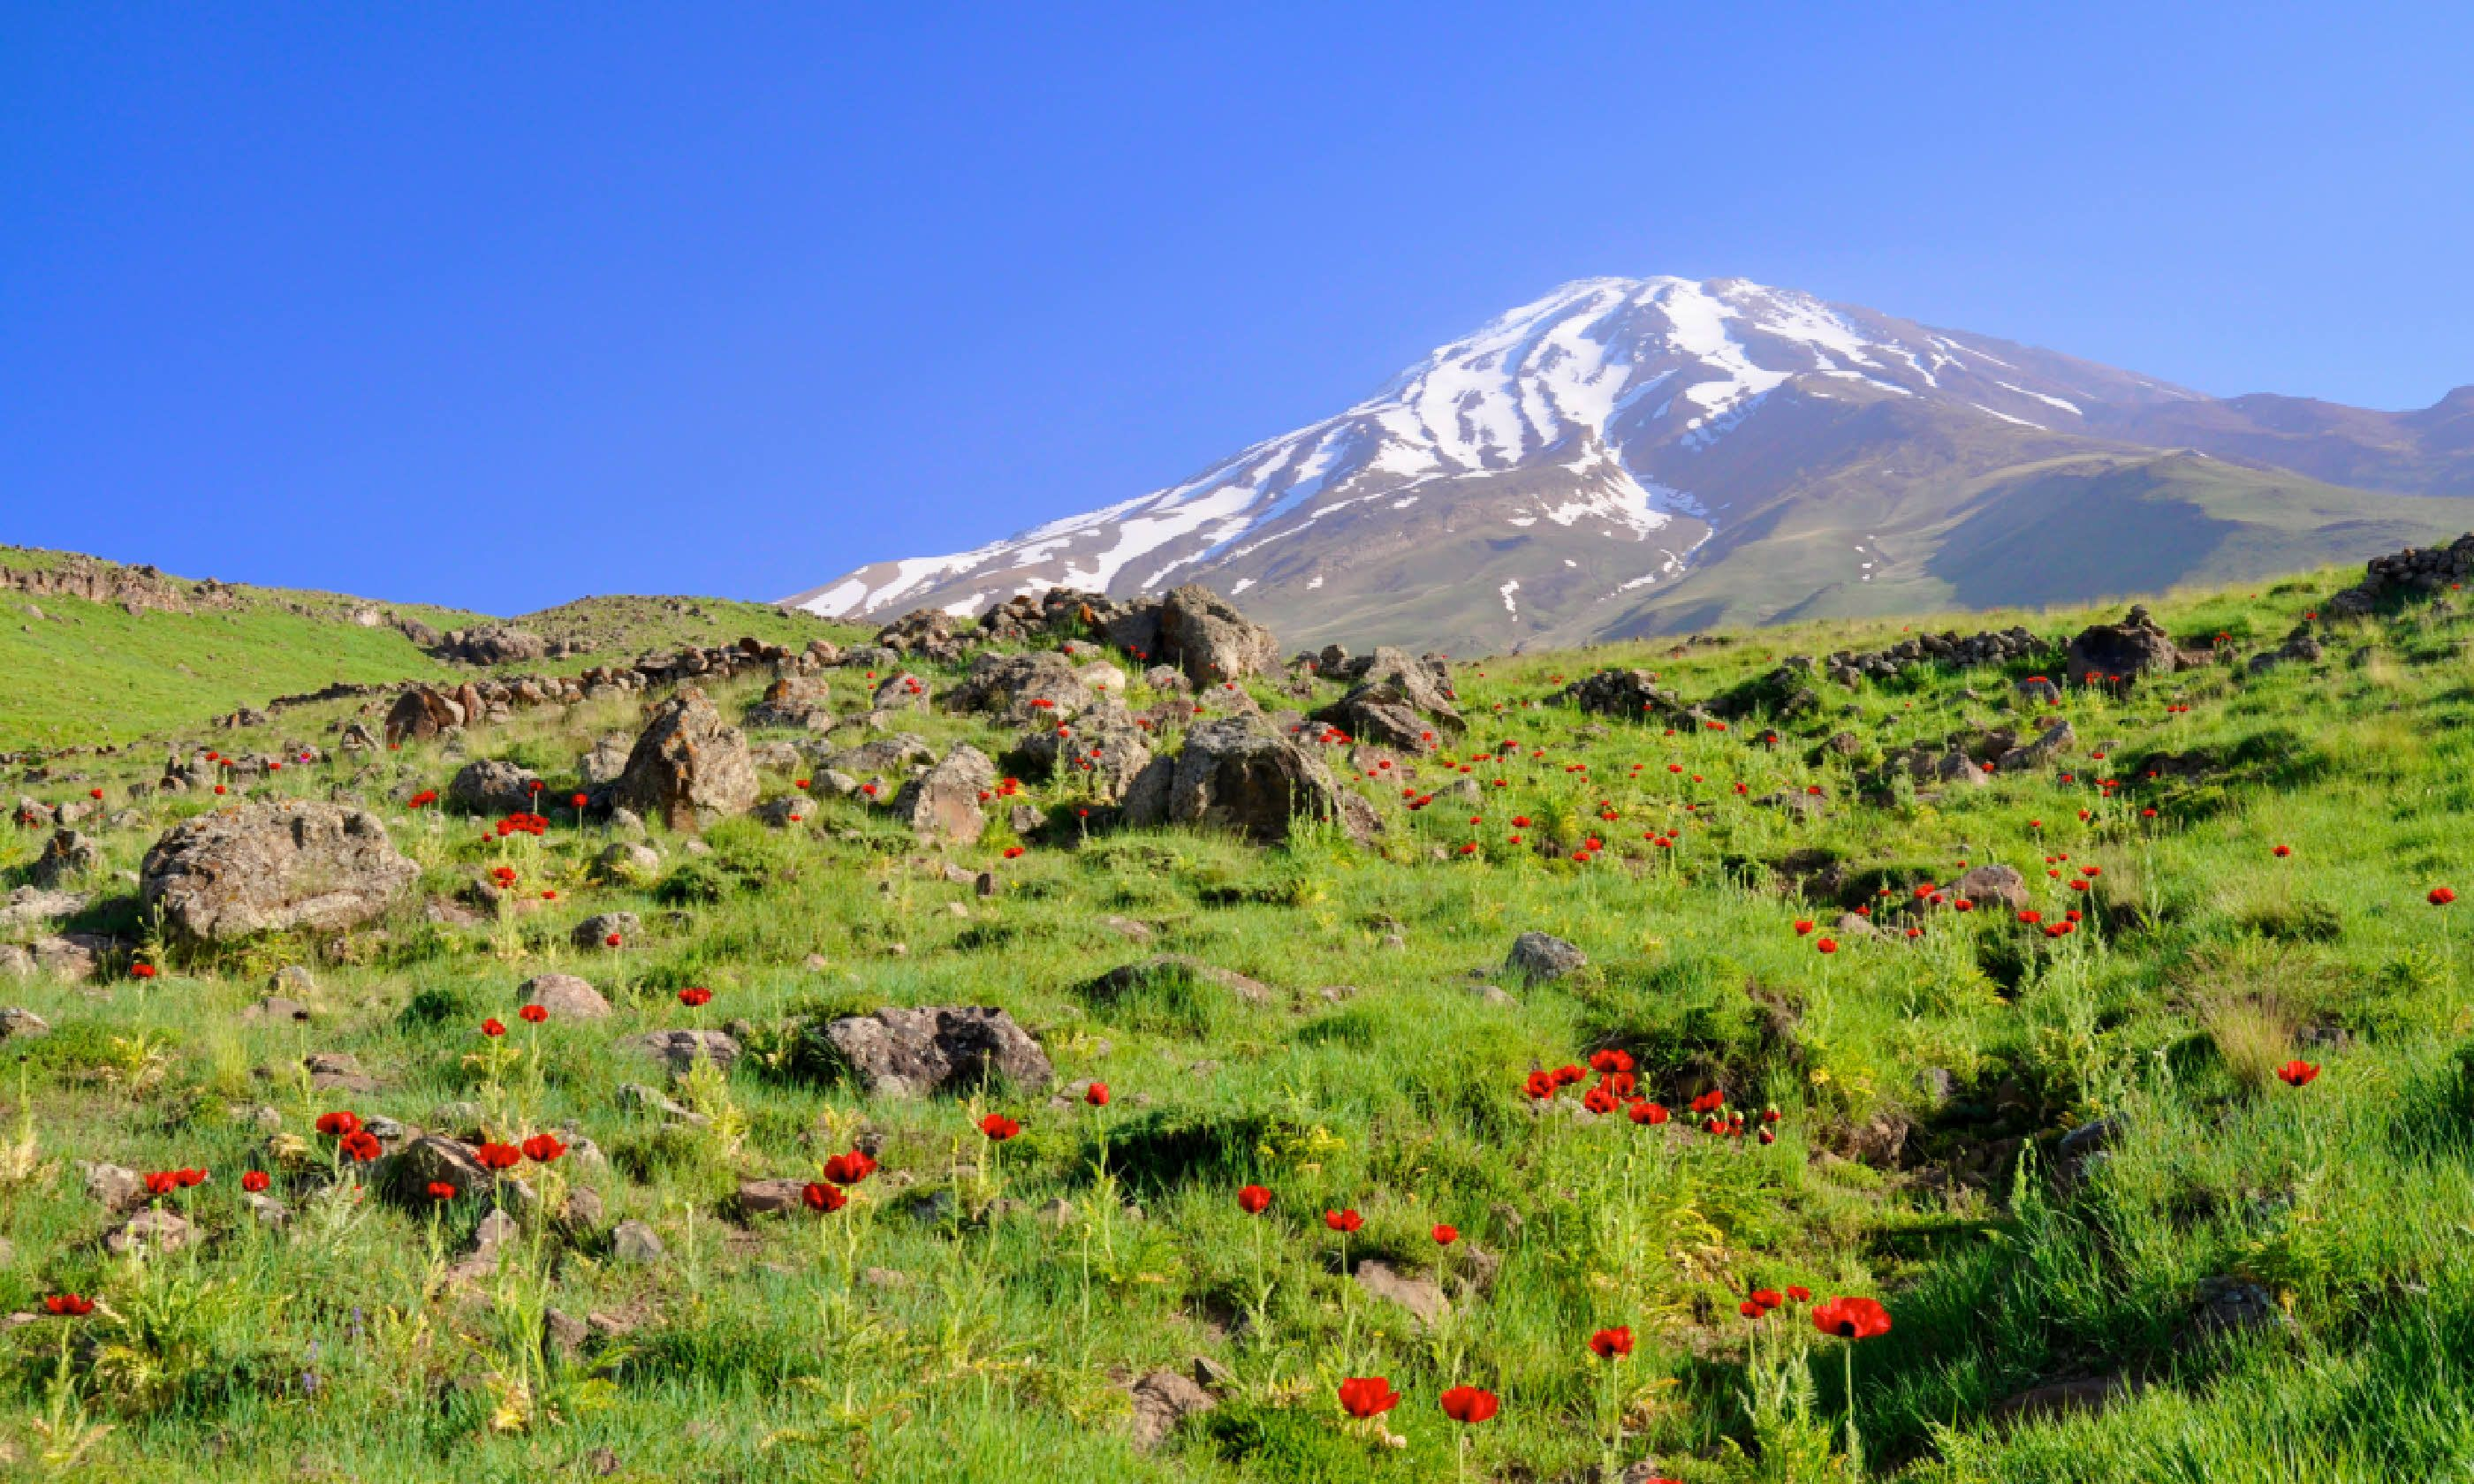 Mt Damavand (Shutterstock)